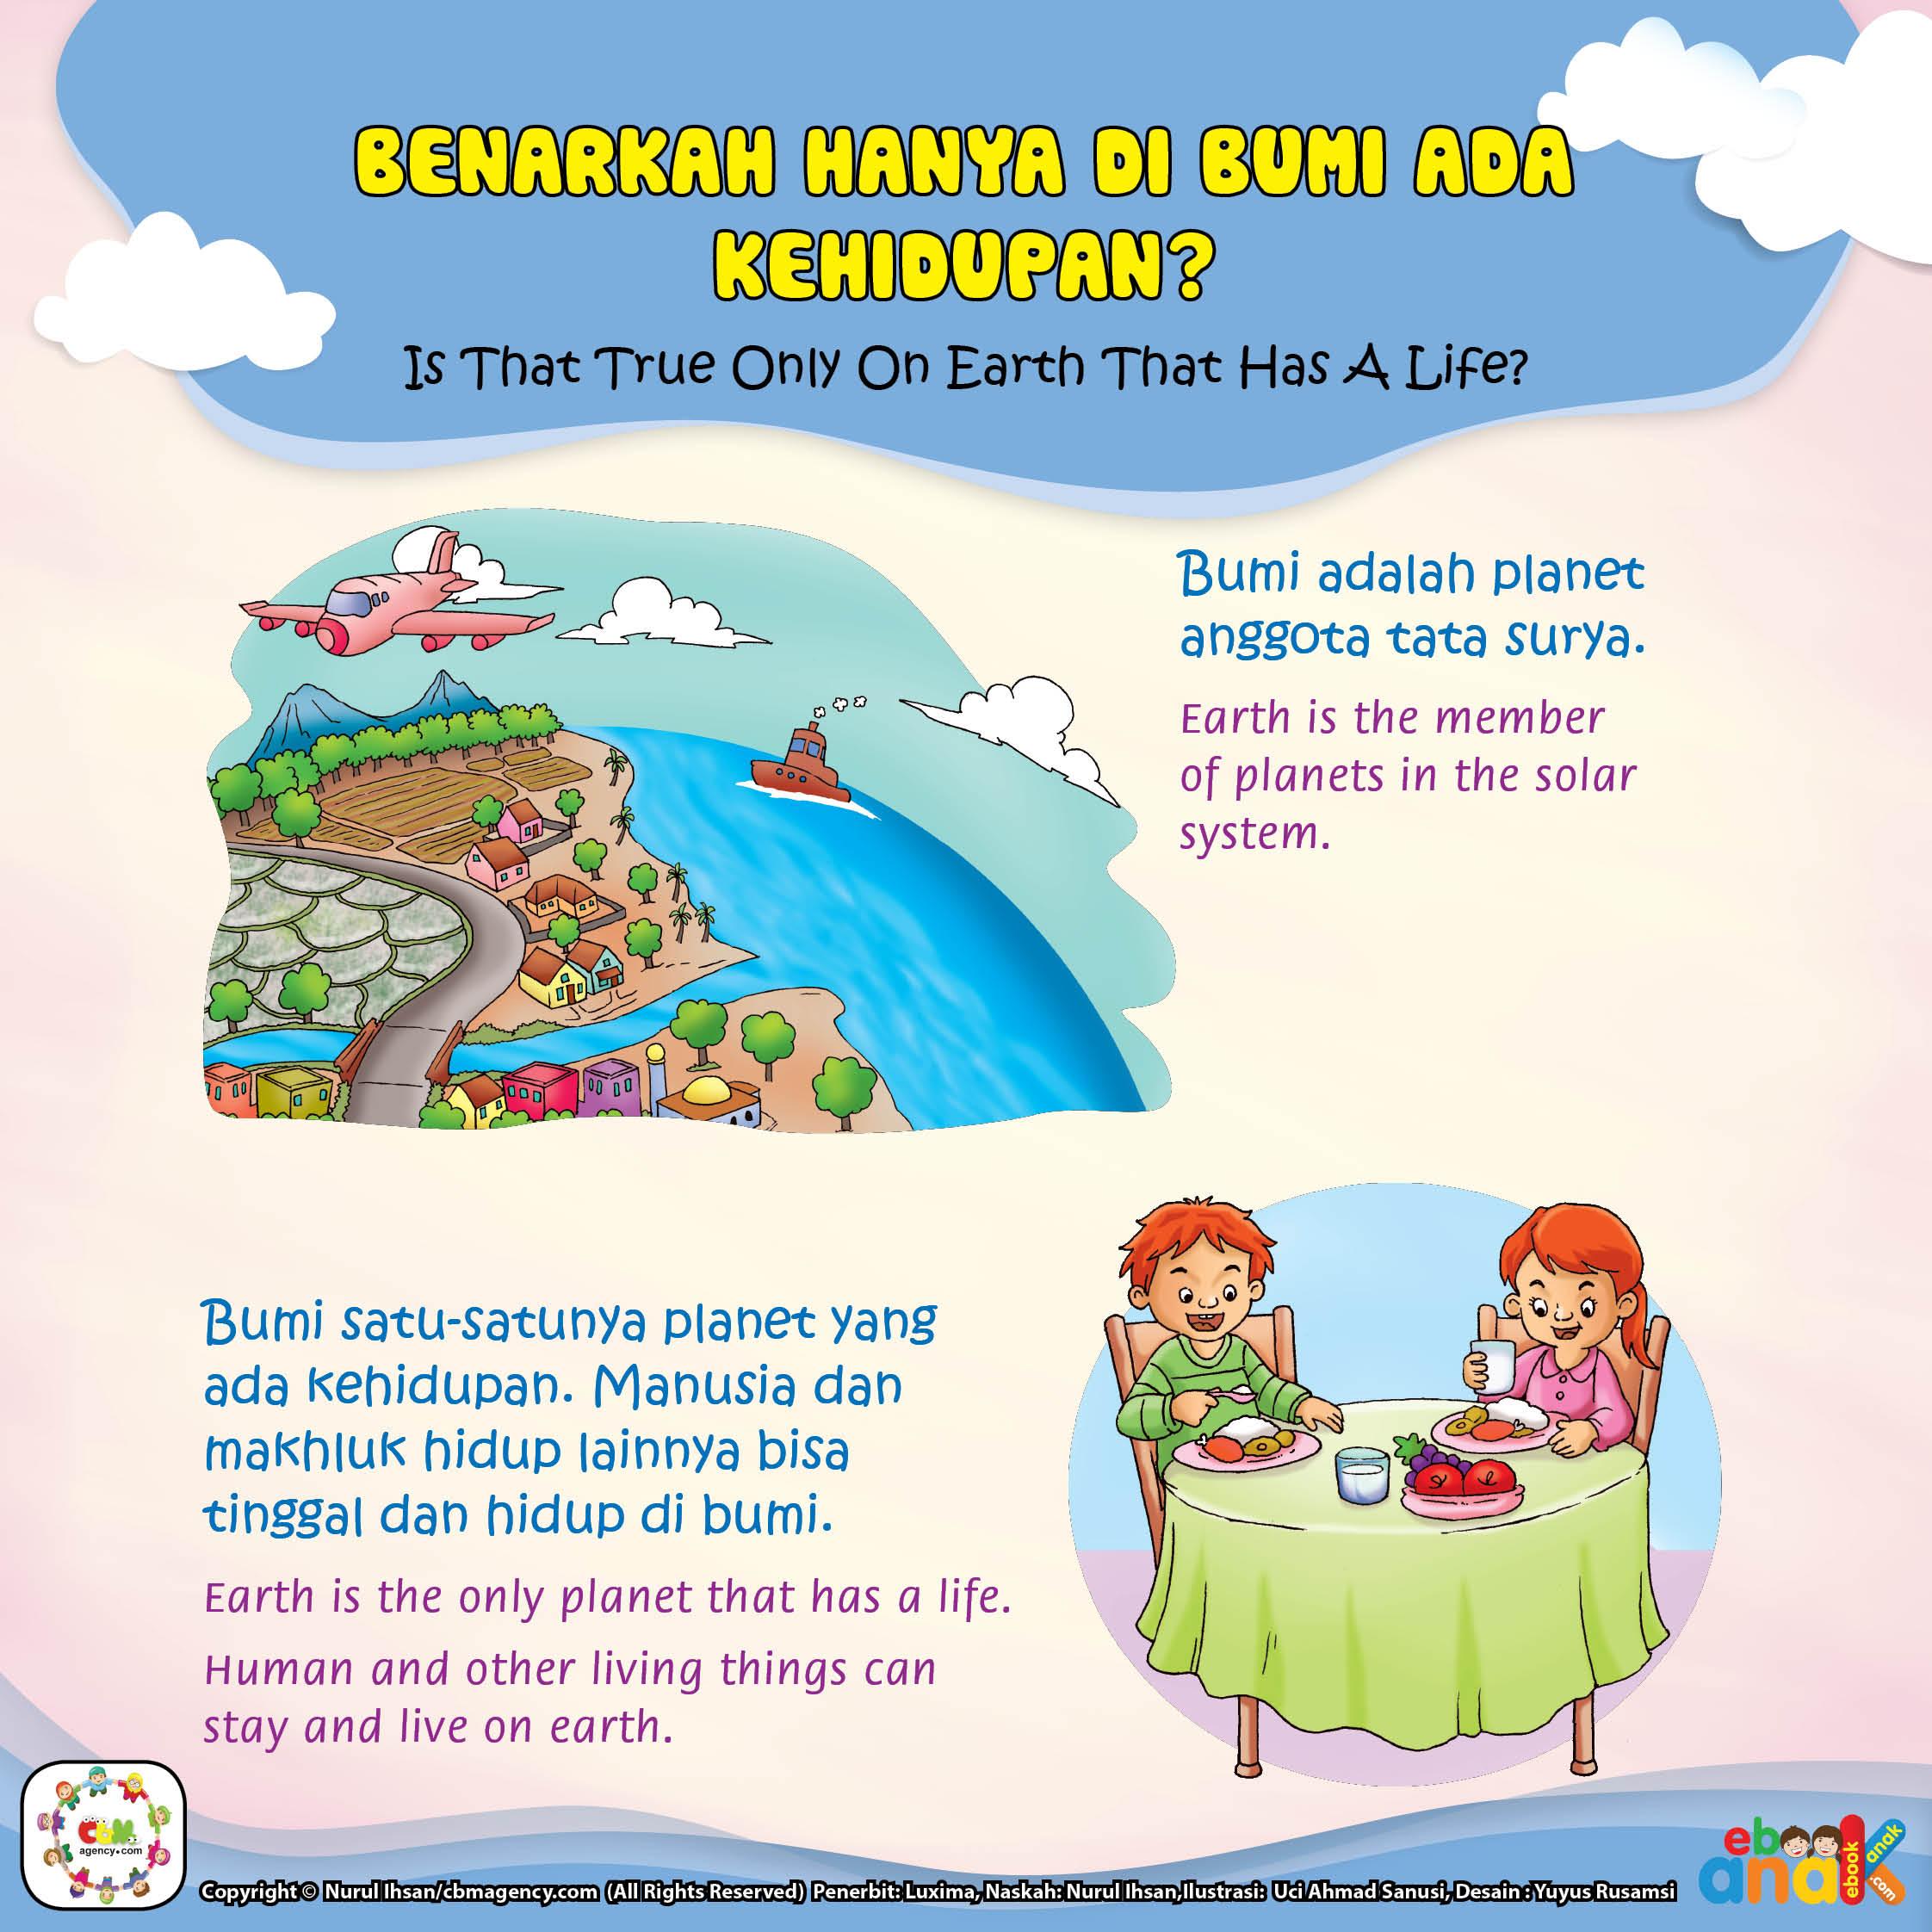 Rahasia Keajaiban Bumi-Benarkah Hanya di Bumi Ada Kehidupan